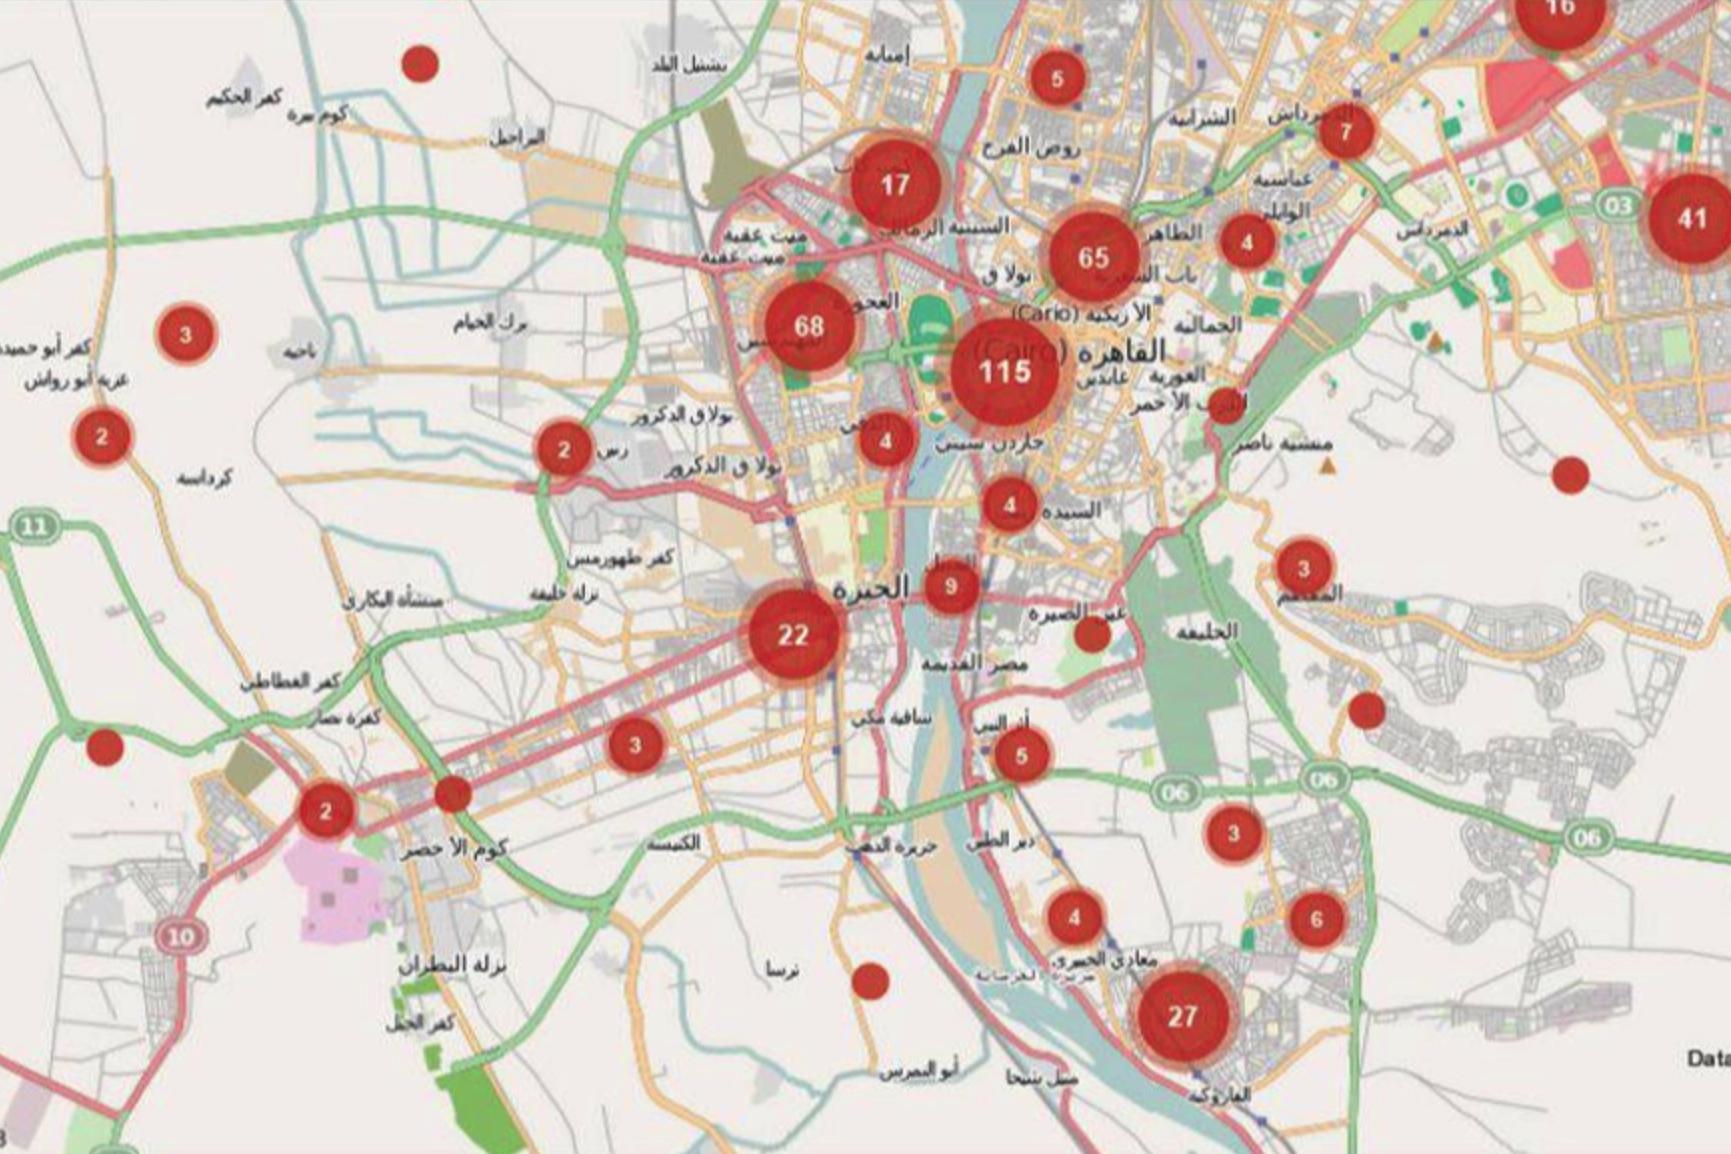 The Cartographic Ambiguities of HarassMap - Nicole Sunday Grove